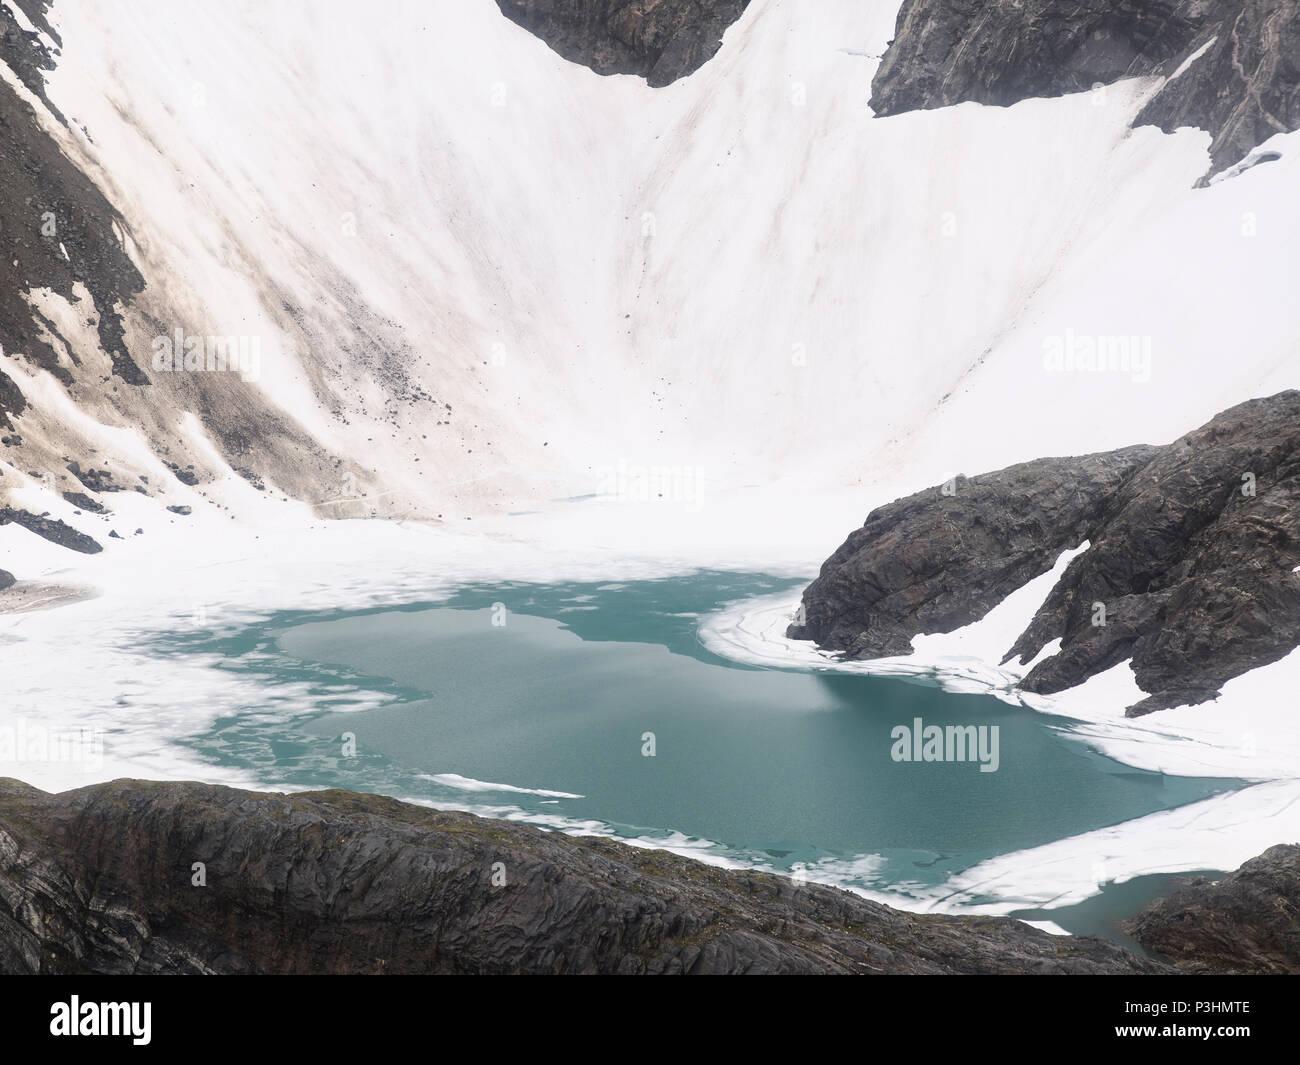 Small Glacial Lake Near Mendenhall Glacier, Alaska - Stock Image